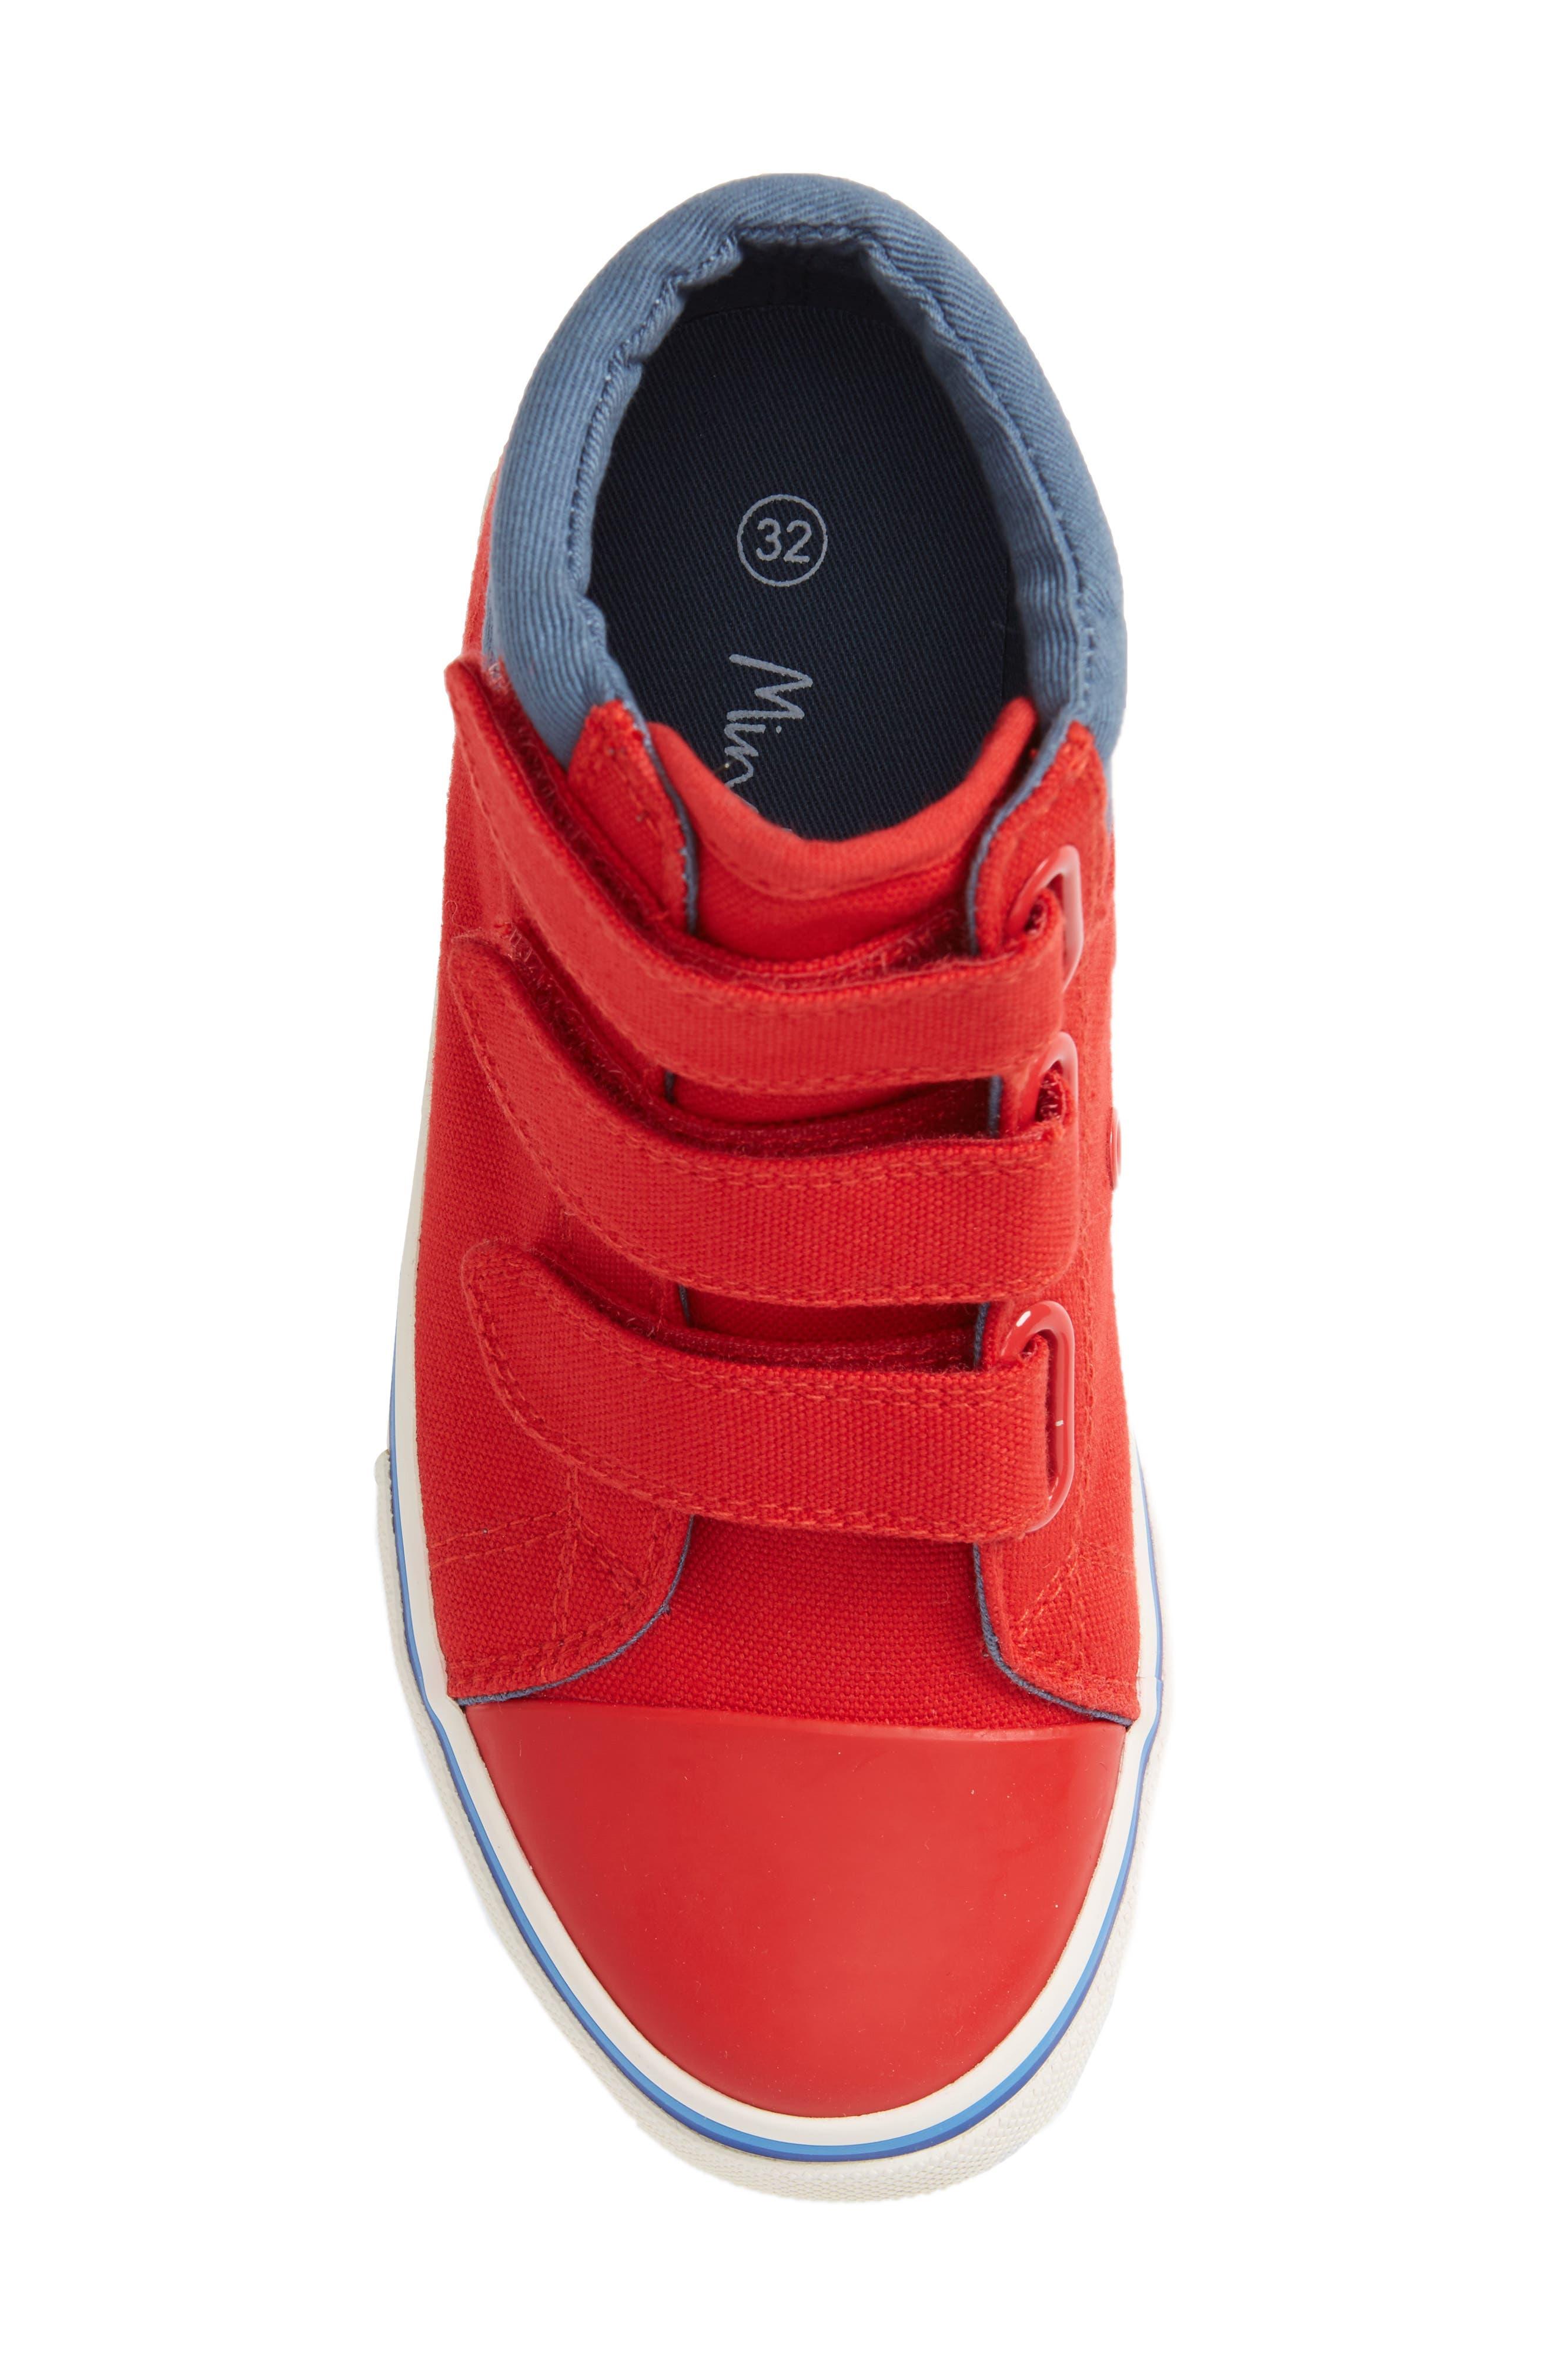 High Top Sneaker,                             Alternate thumbnail 5, color,                             614